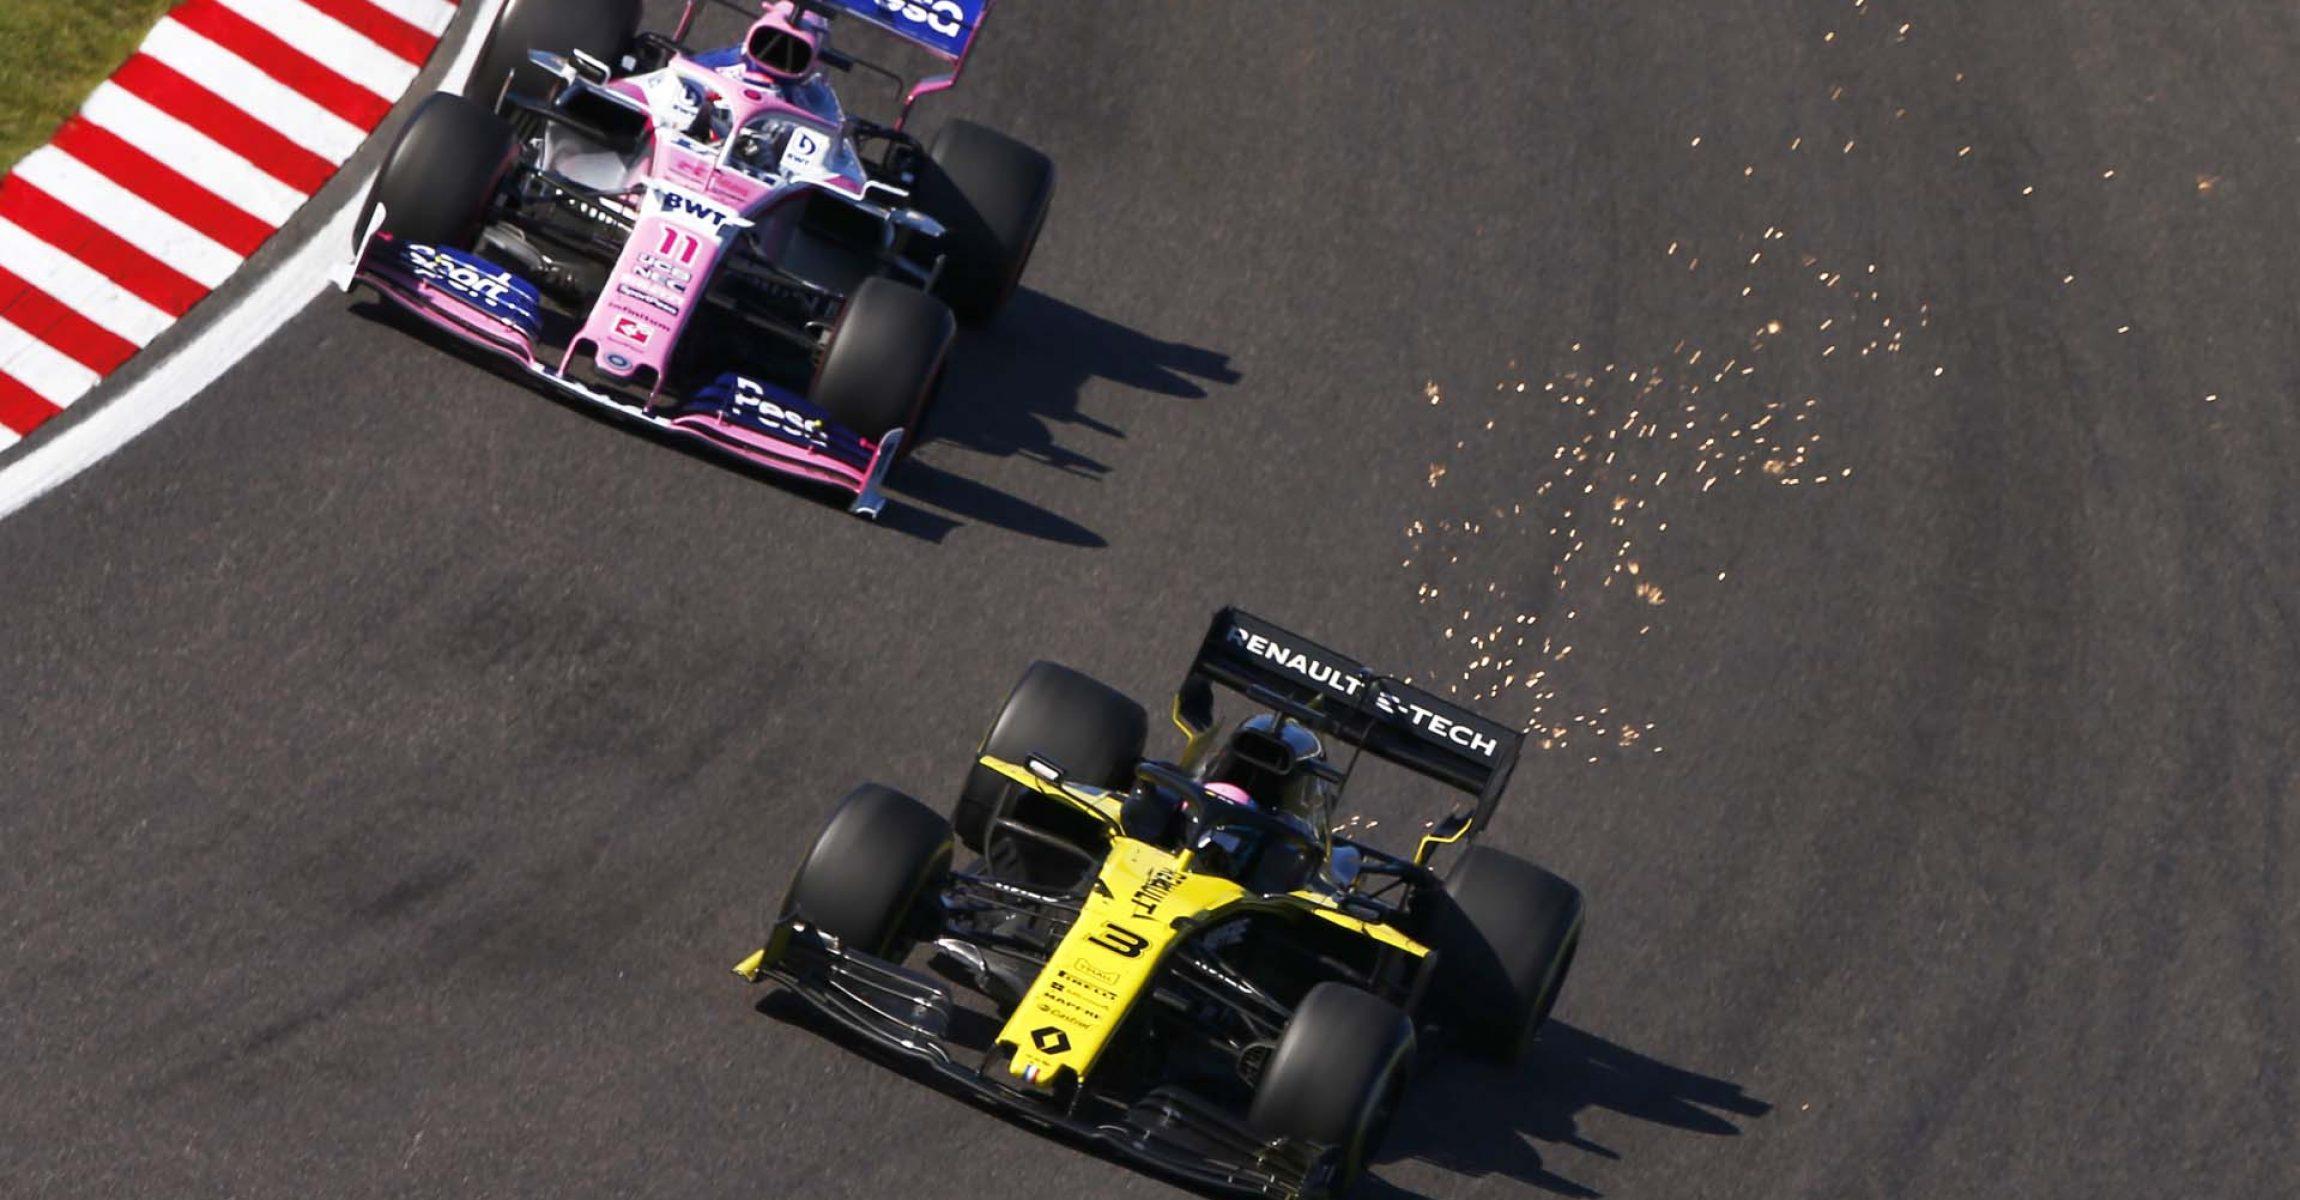 Daniel Ricciardo, Renault R.S.19 and Sergio Perez, Racing Point RP19